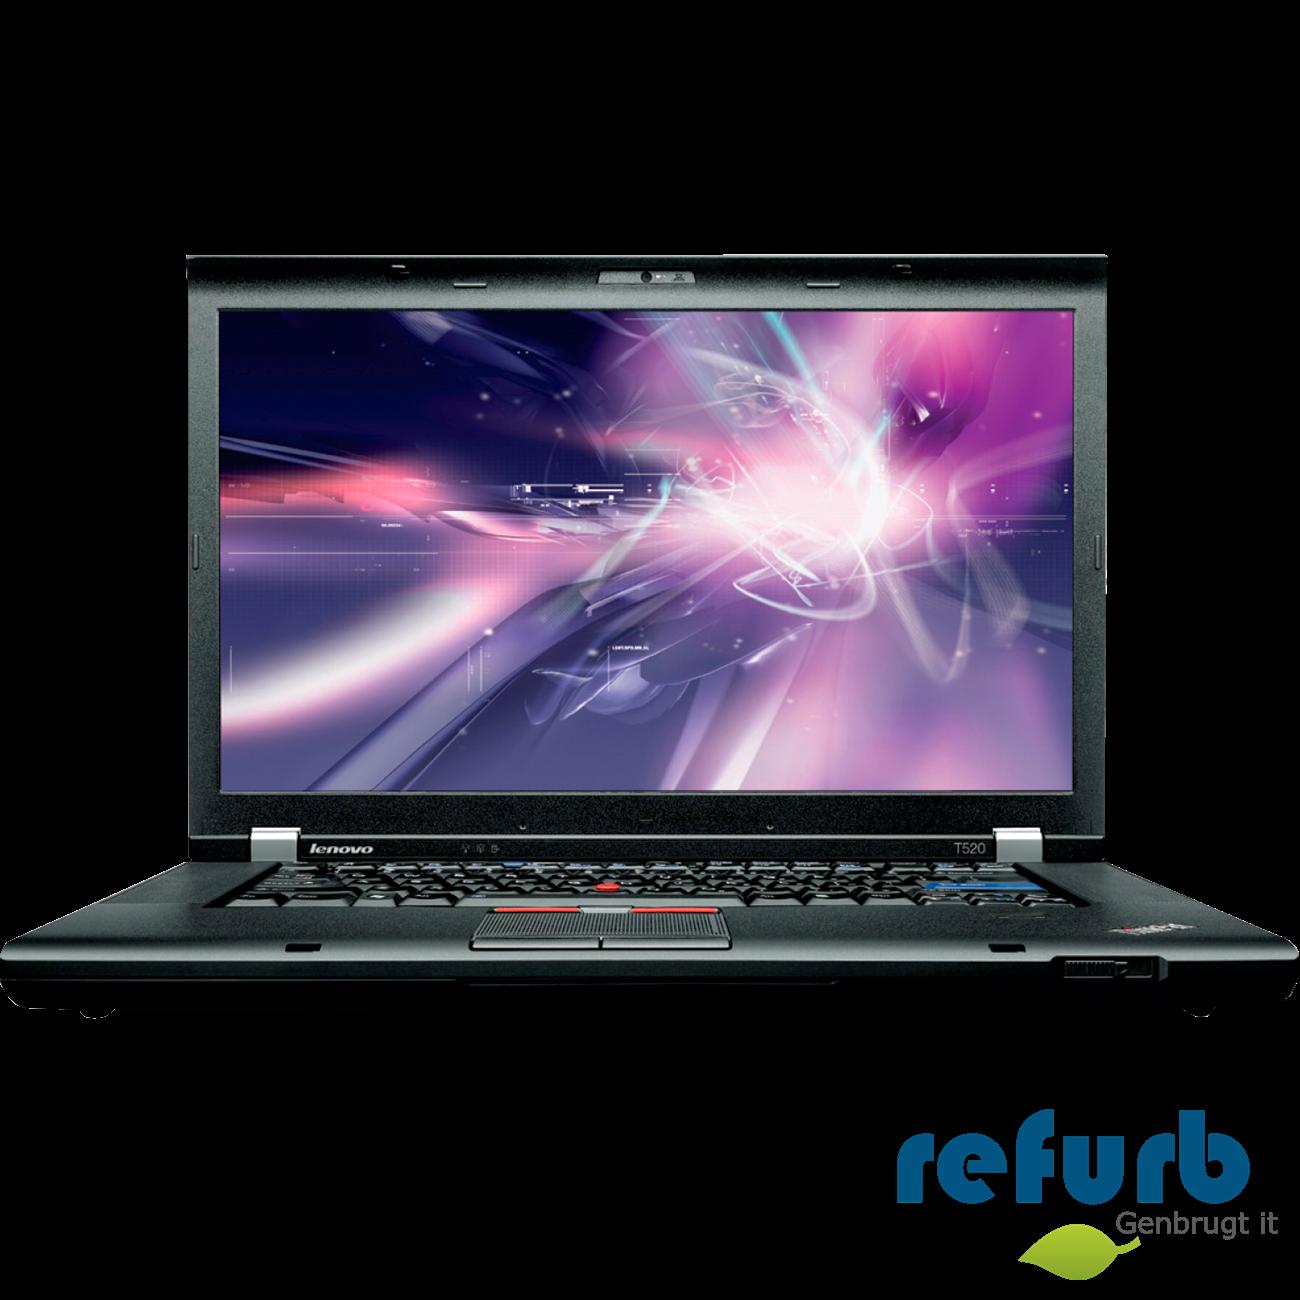 Lenovo – Lenovo thinkpad t520 fra refurb